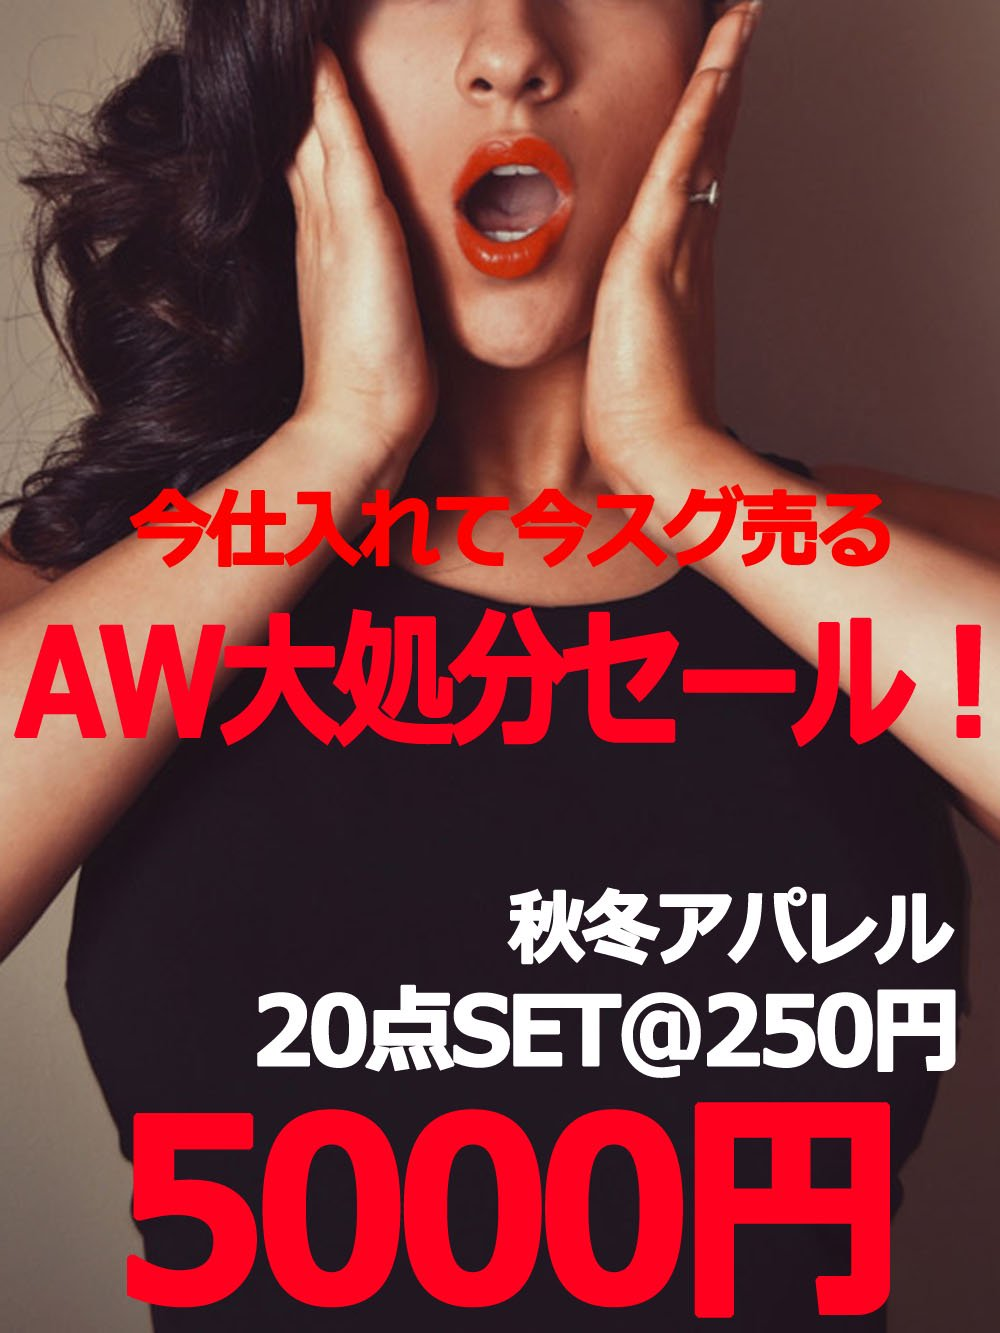 【AW大処分セール】今仕入れて今スグ売る☆秋冬アパレル【20点】@250円